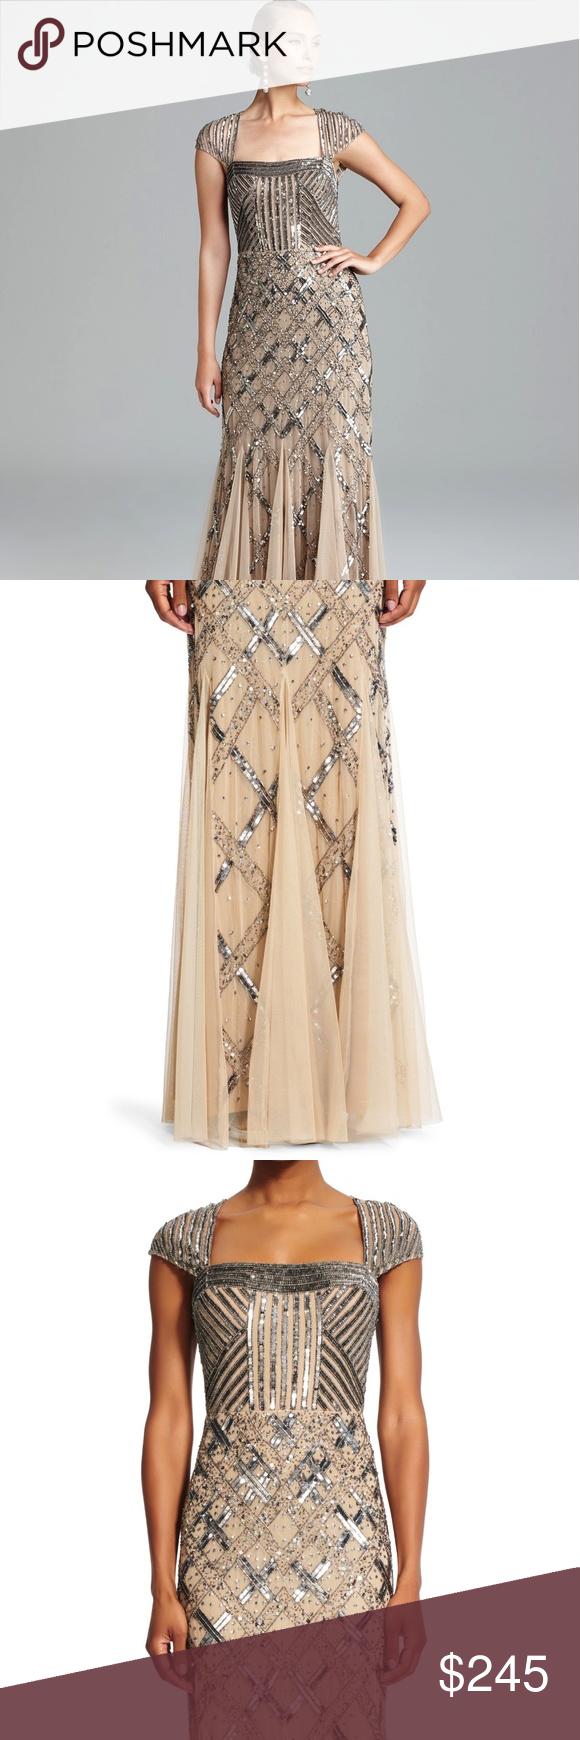 Adrianna papell beaded gown brilliant beaded ribbon designs splash